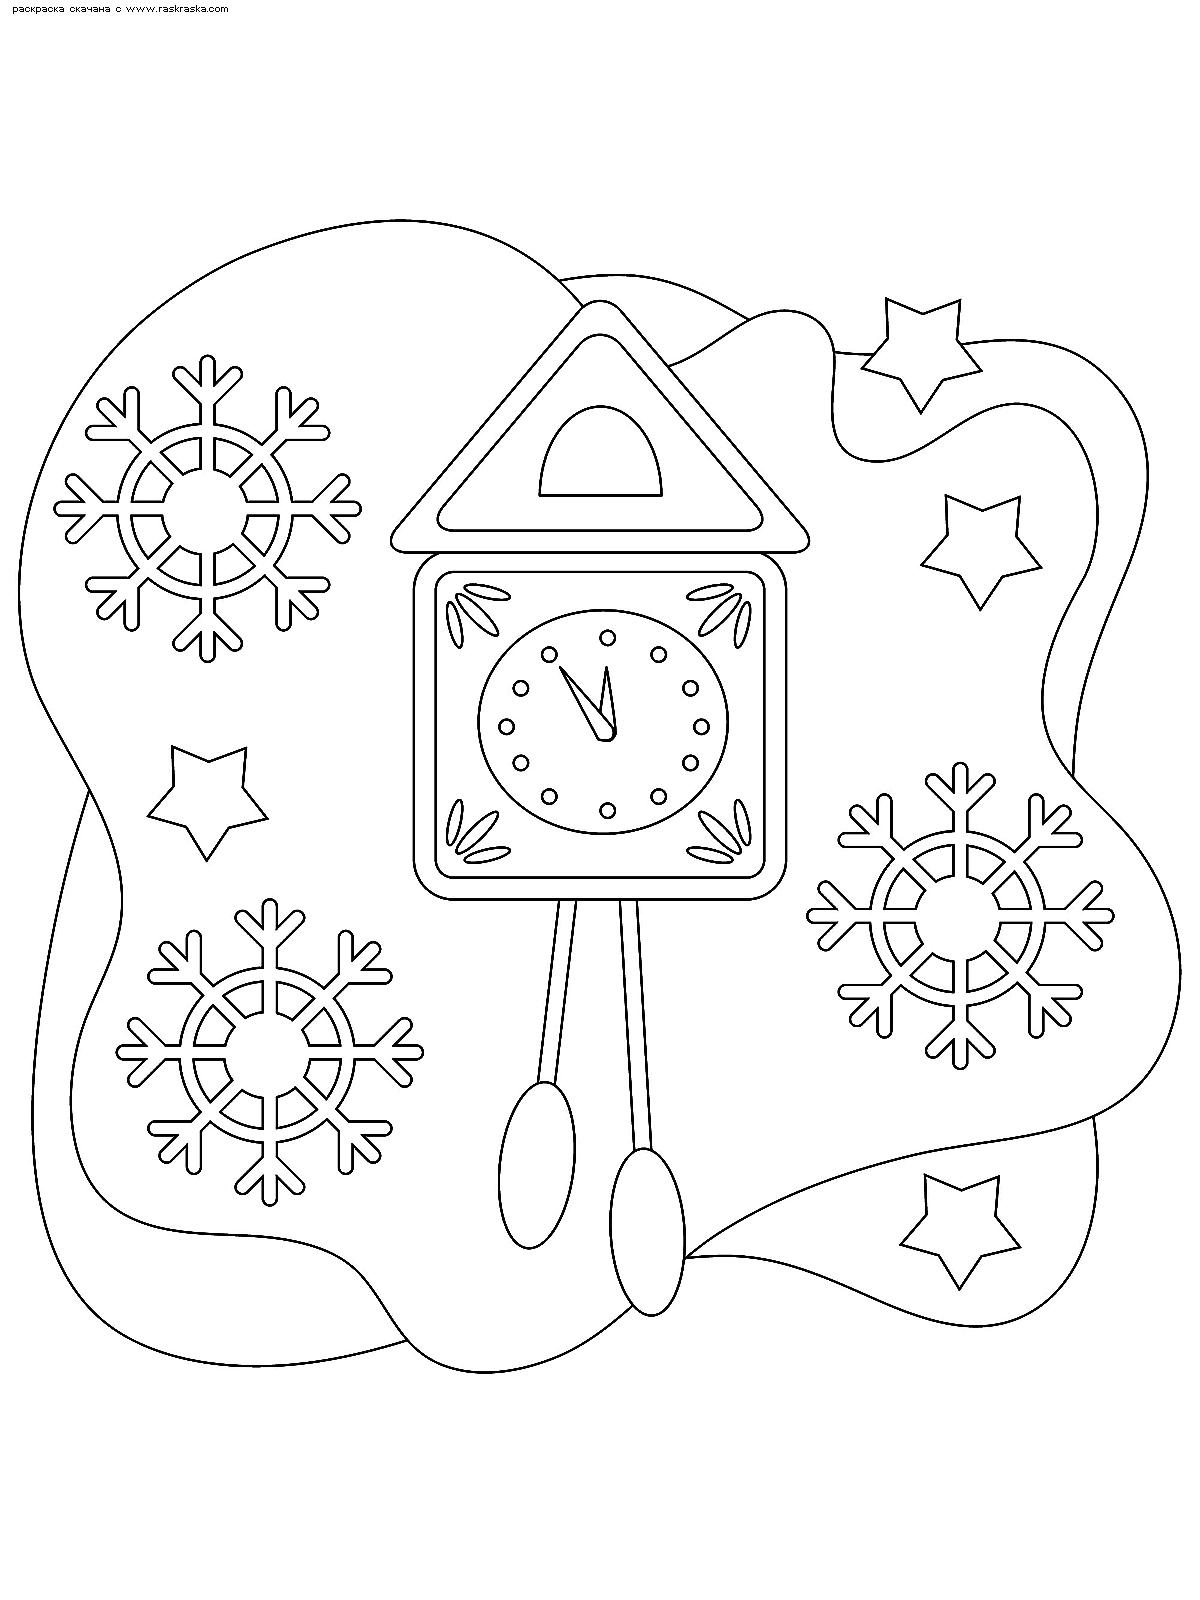 Раскраска Часы-ходики. Раскраска часы, ходики, новый год